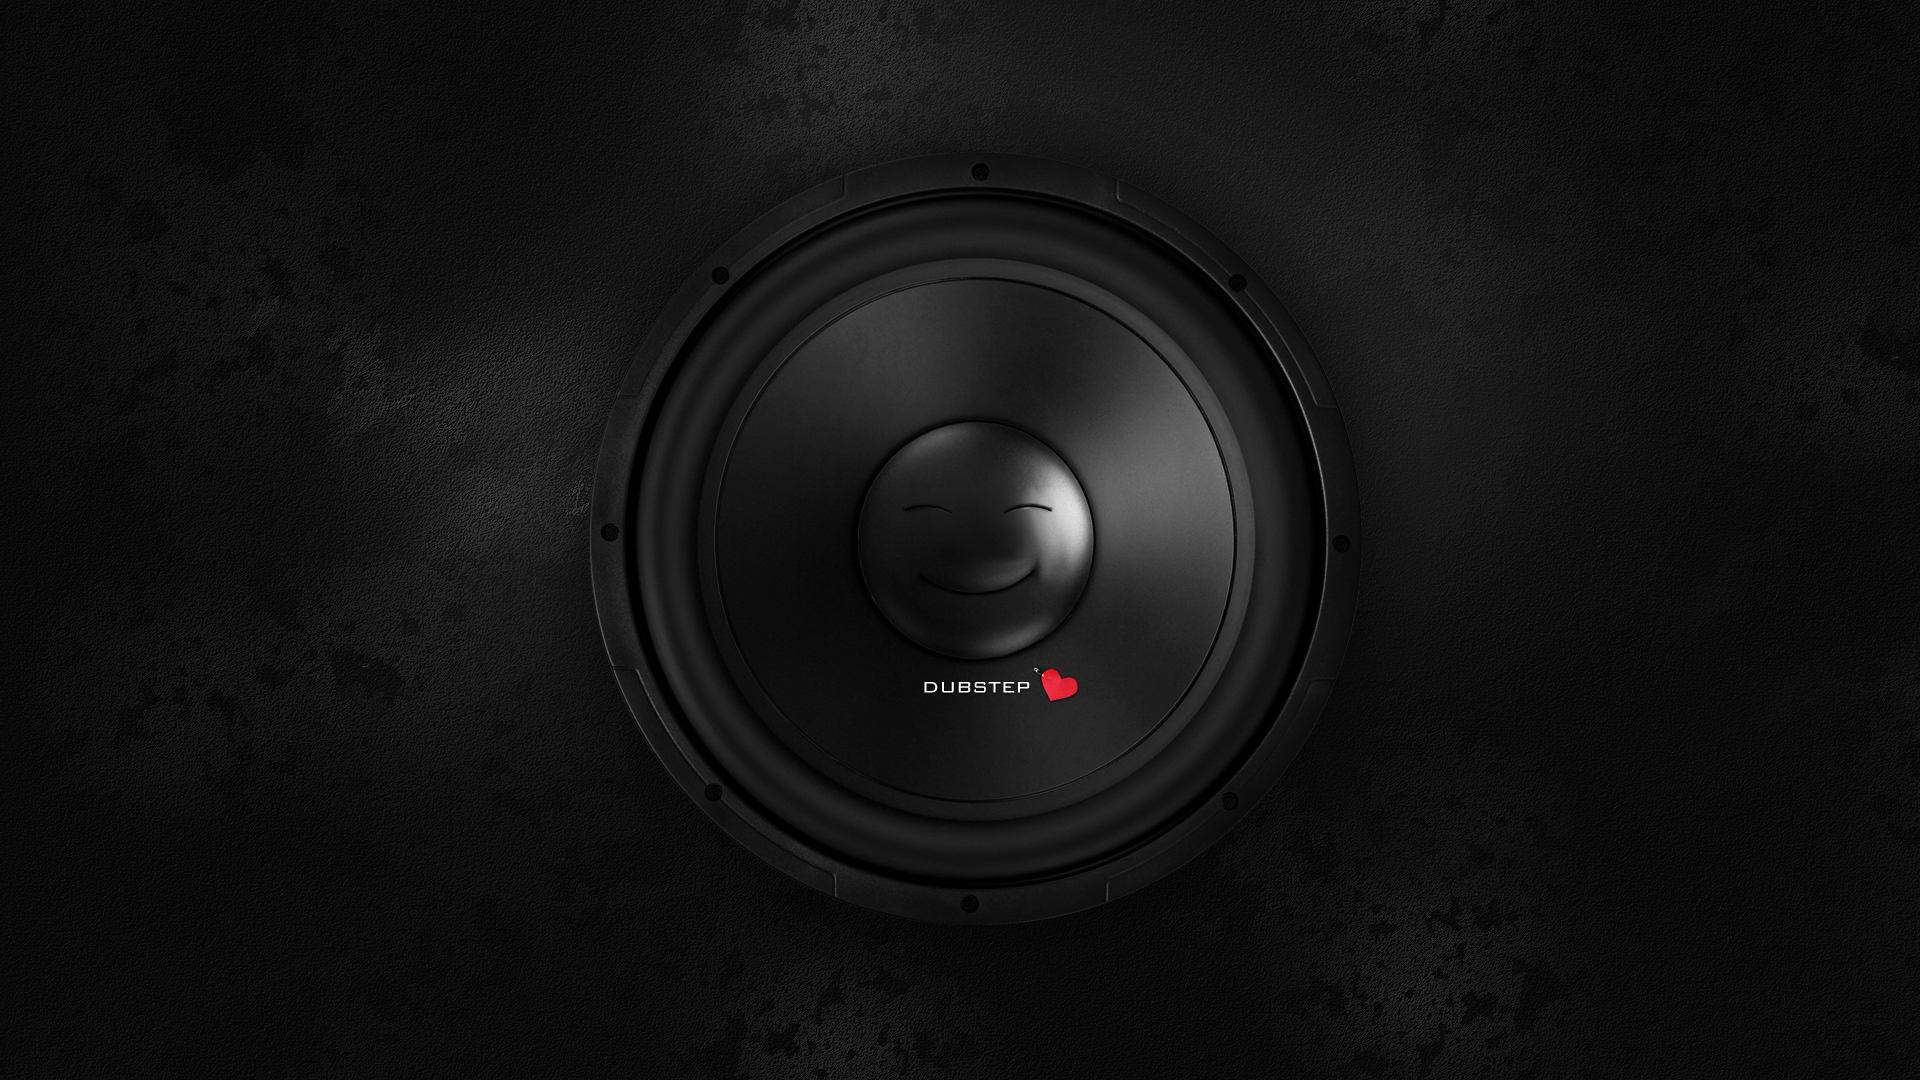 Dubstep electronic speaker speakers wallpaper | 1920x1080 ...